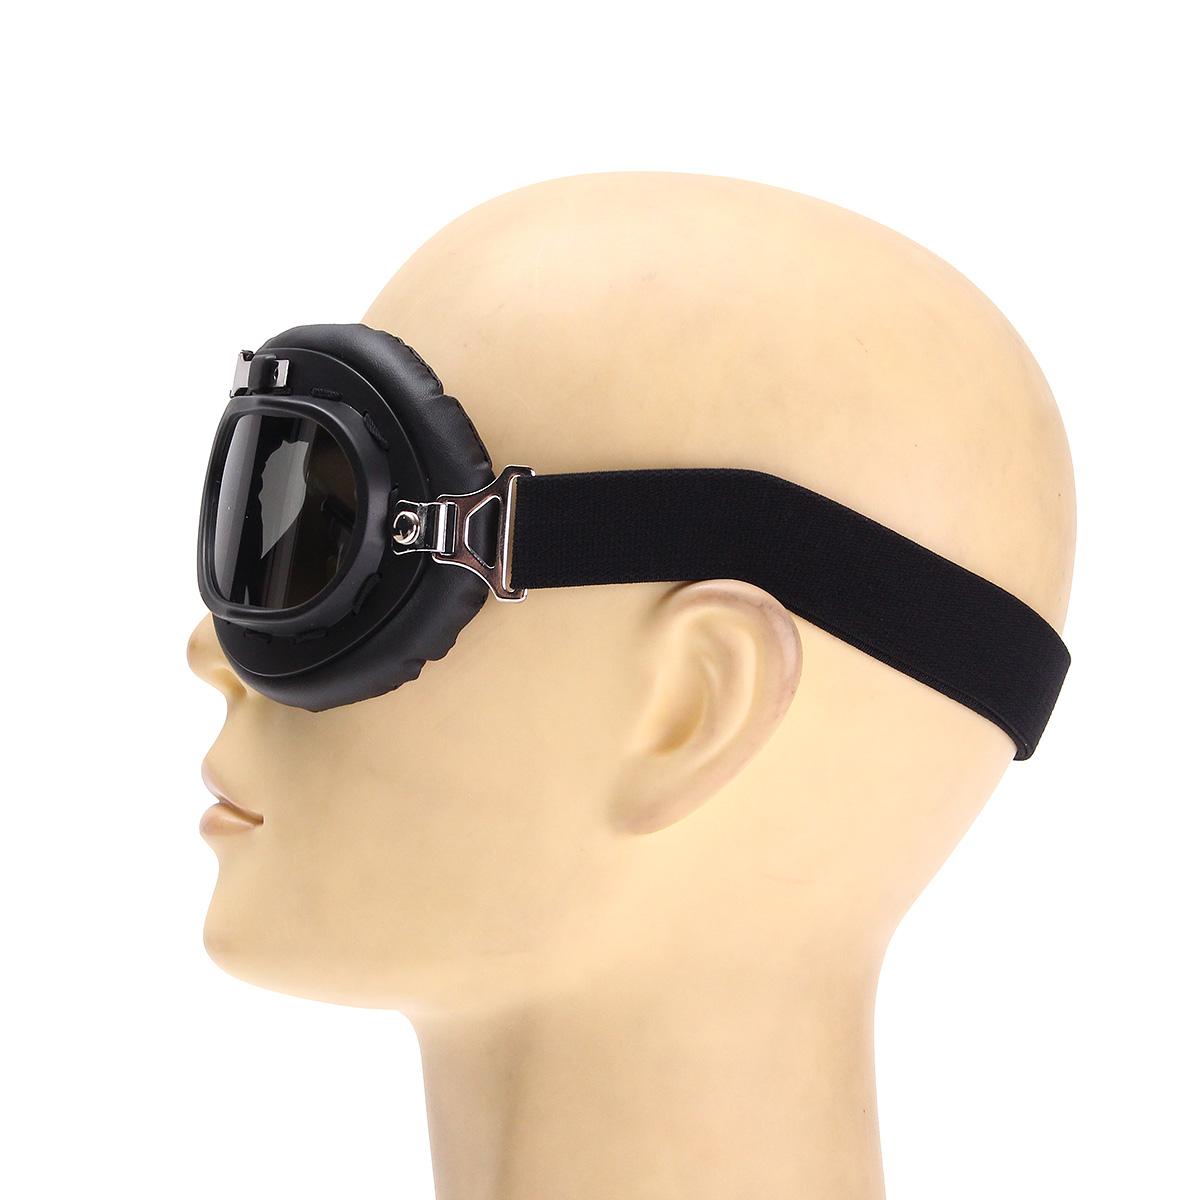 Motorcycle Biker Flying Goggles Helmet Glasses Protector Windproof Anti-UV